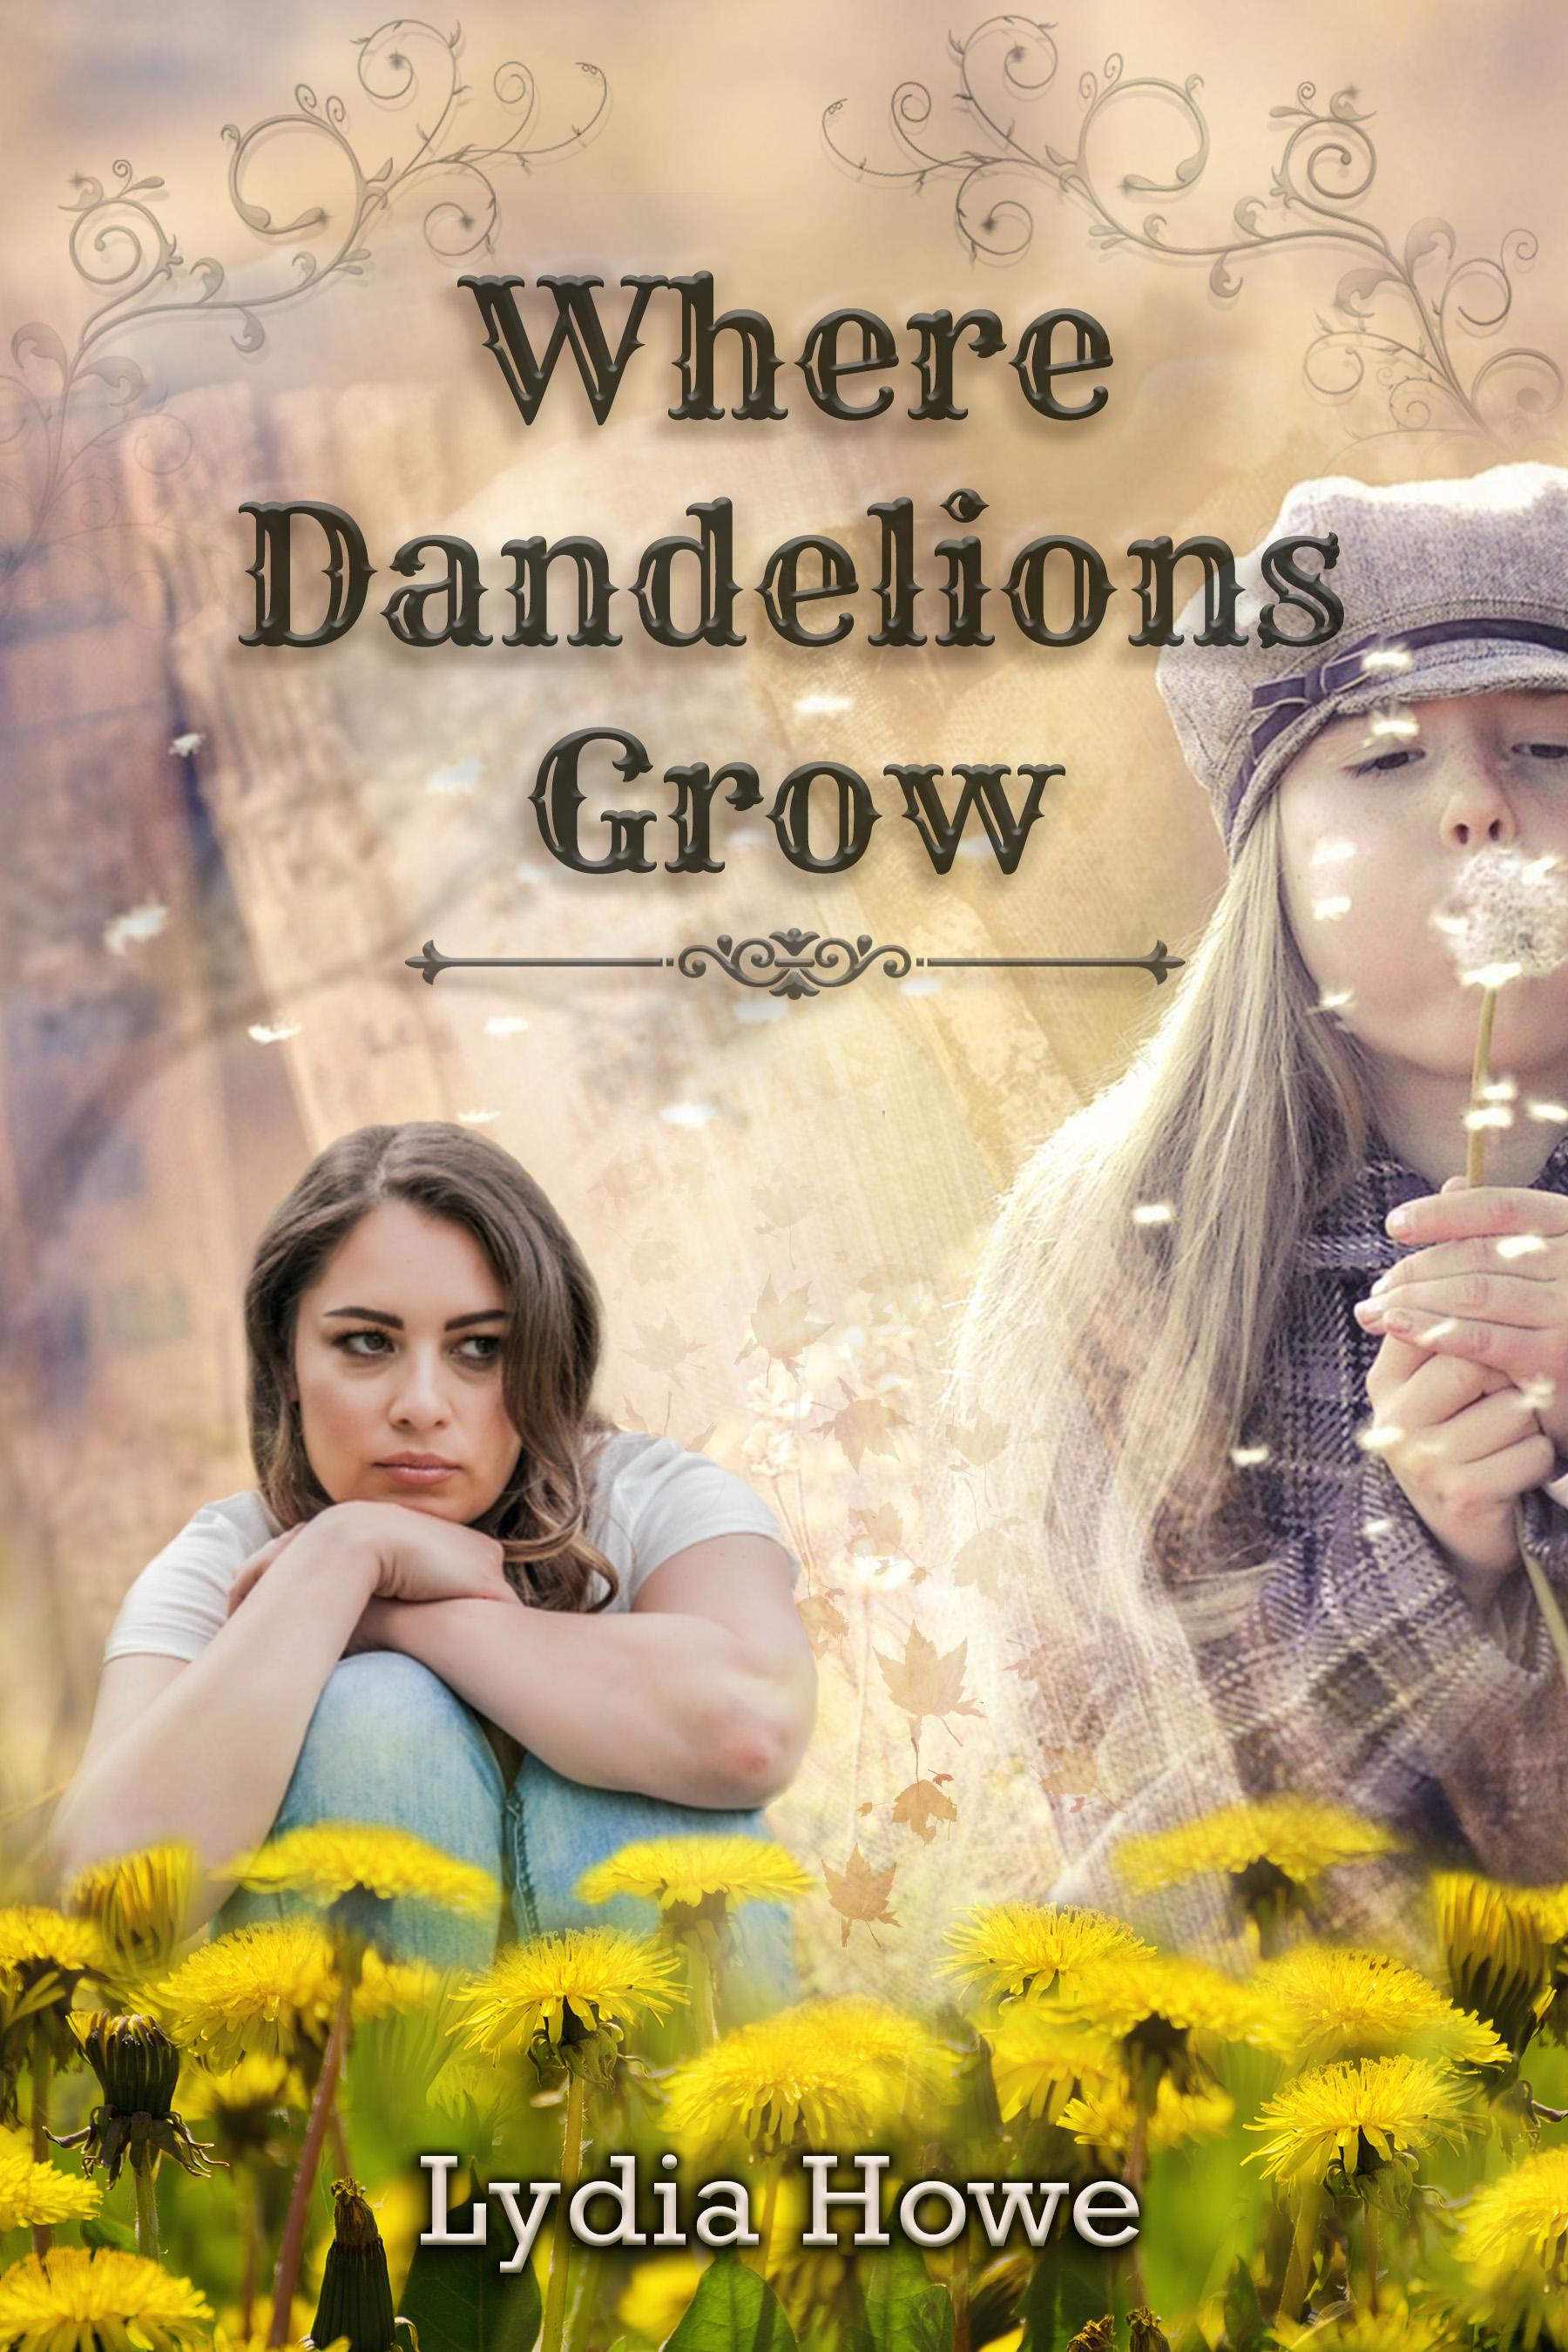 Where Dandelions Grow v1.21